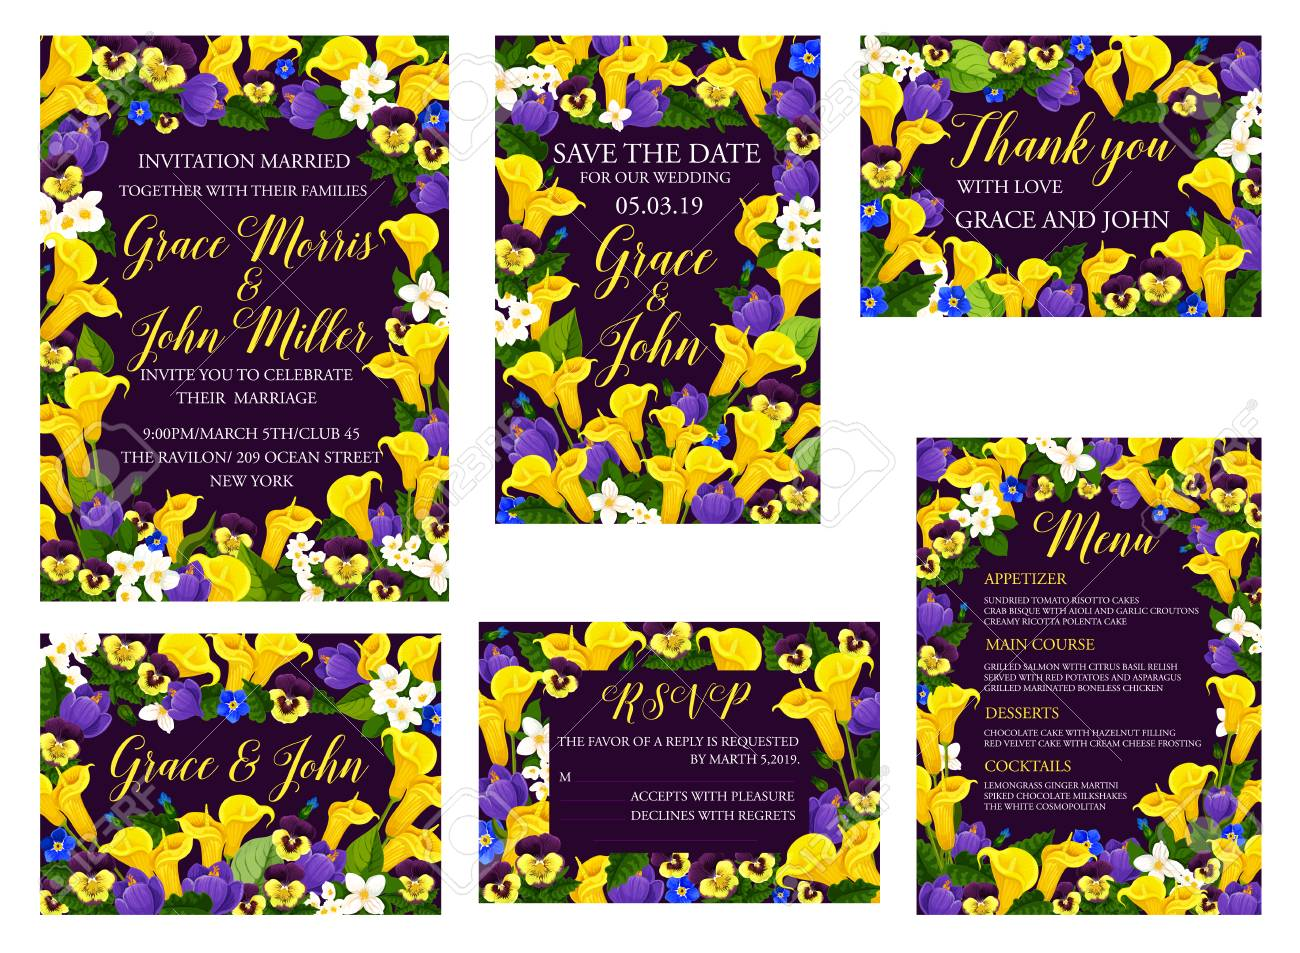 Wedding Ceremony Celebration Floral Banner For Invitation Template